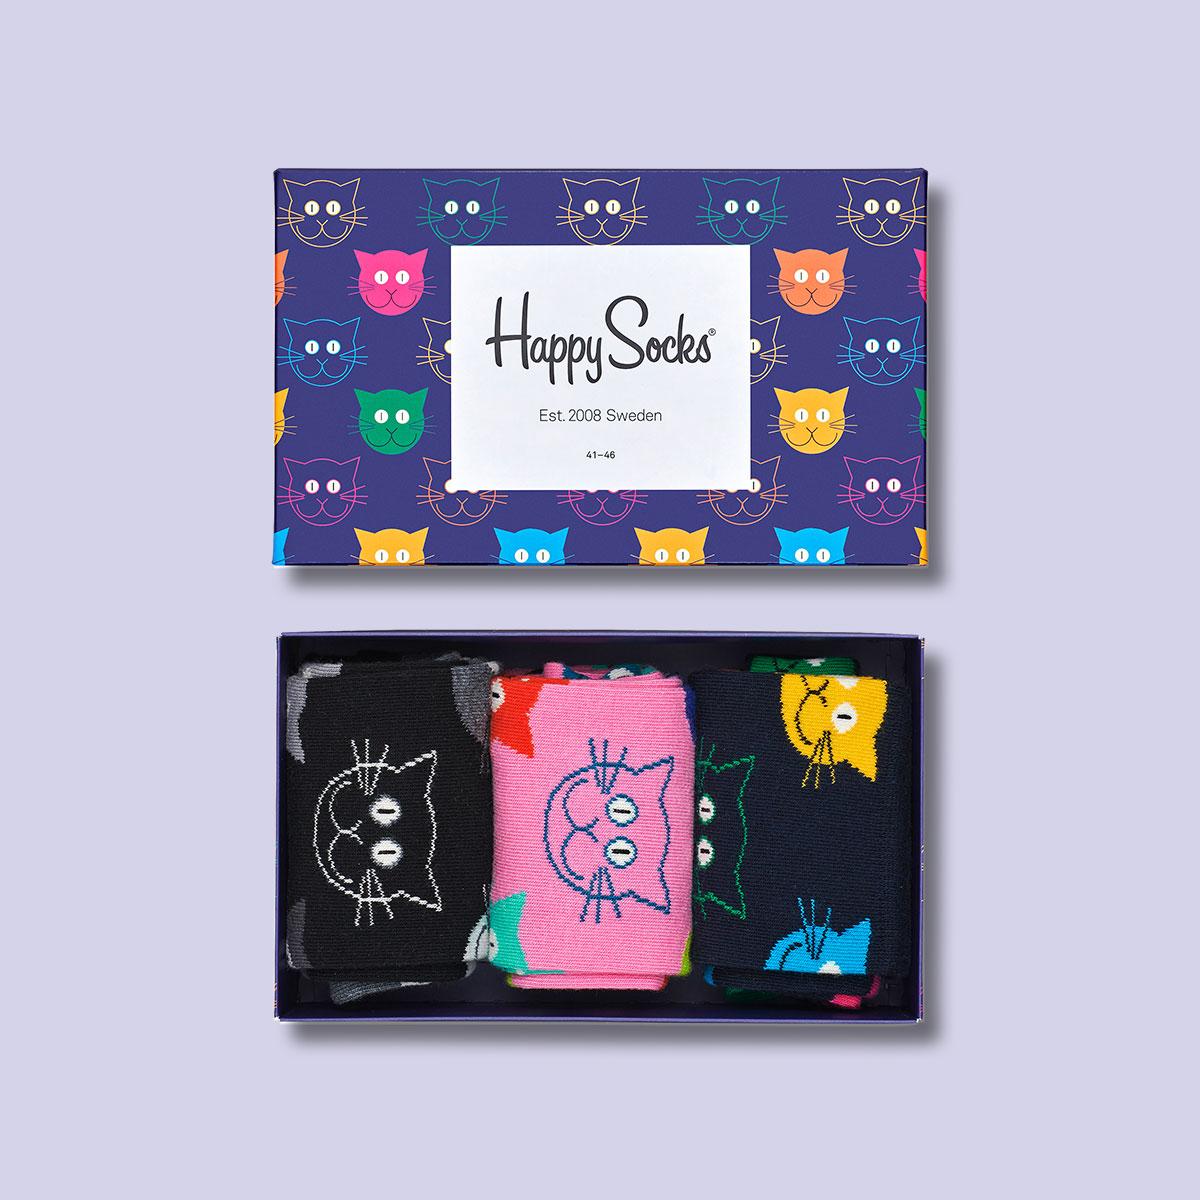 Happy Socks ハッピーソックス  MIXED CAT( ミックスド キャット ) 3足組 ギフトセット 綿混 クルー丈 ソックス 靴下 GIFT BOX ユニセックス メンズ 男性 紳士 プレゼント ギフト 10140001【ゆうパケットお取り扱い不可】